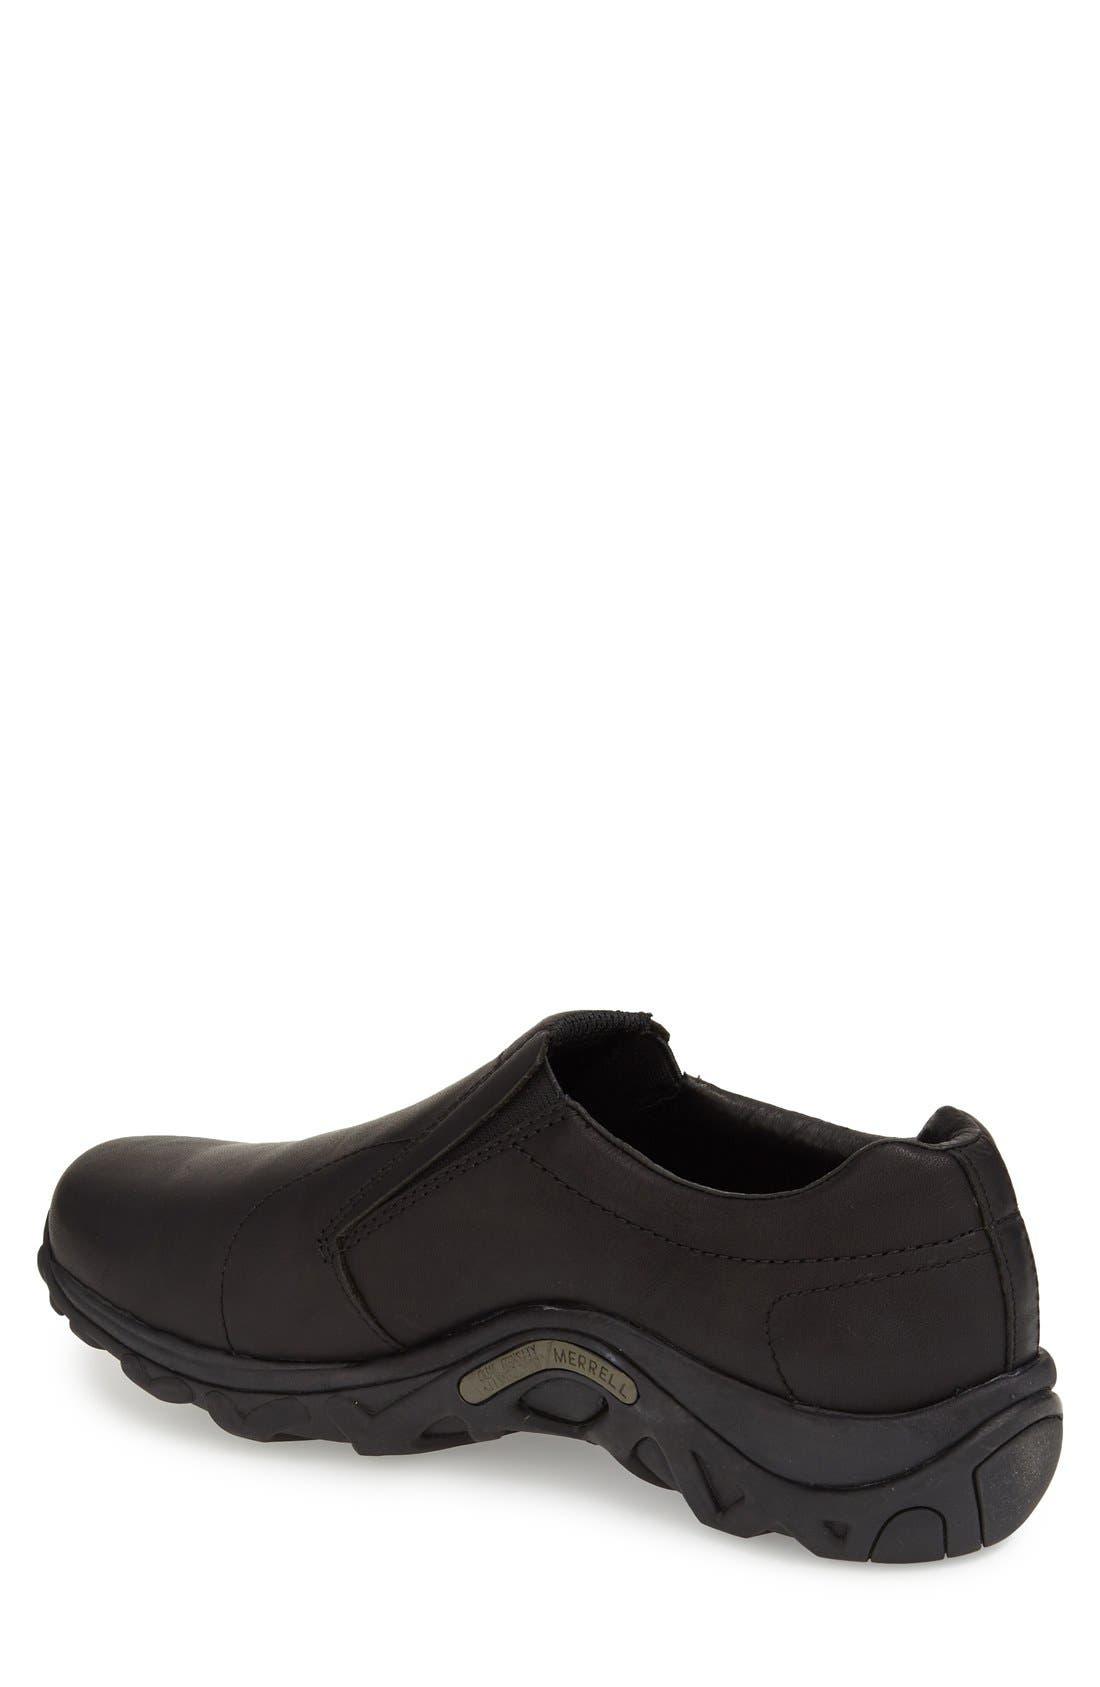 'Jungle Moc' Leather Athletic Slip-On,                             Alternate thumbnail 3, color,                             BLACK